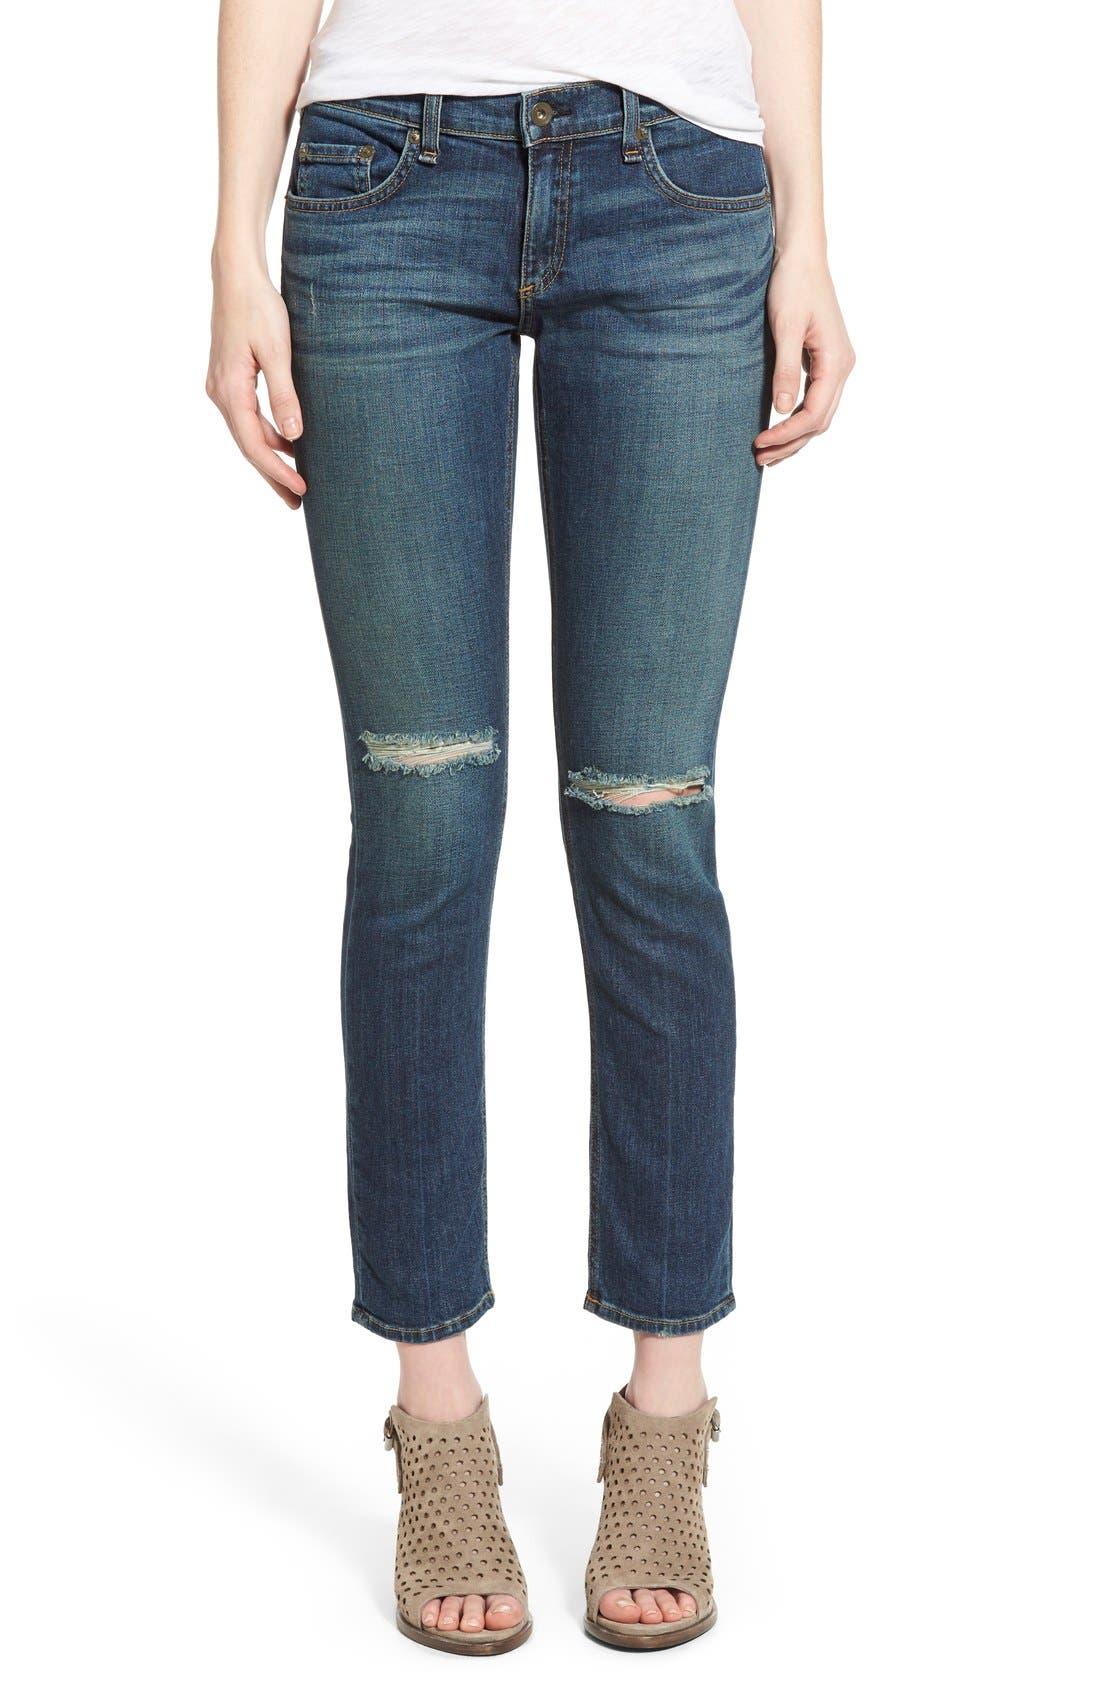 Alternate Image 1 Selected - rag & bone/JEAN 'Tomboy' Boyfriend Skinny Jeans (Burnley)